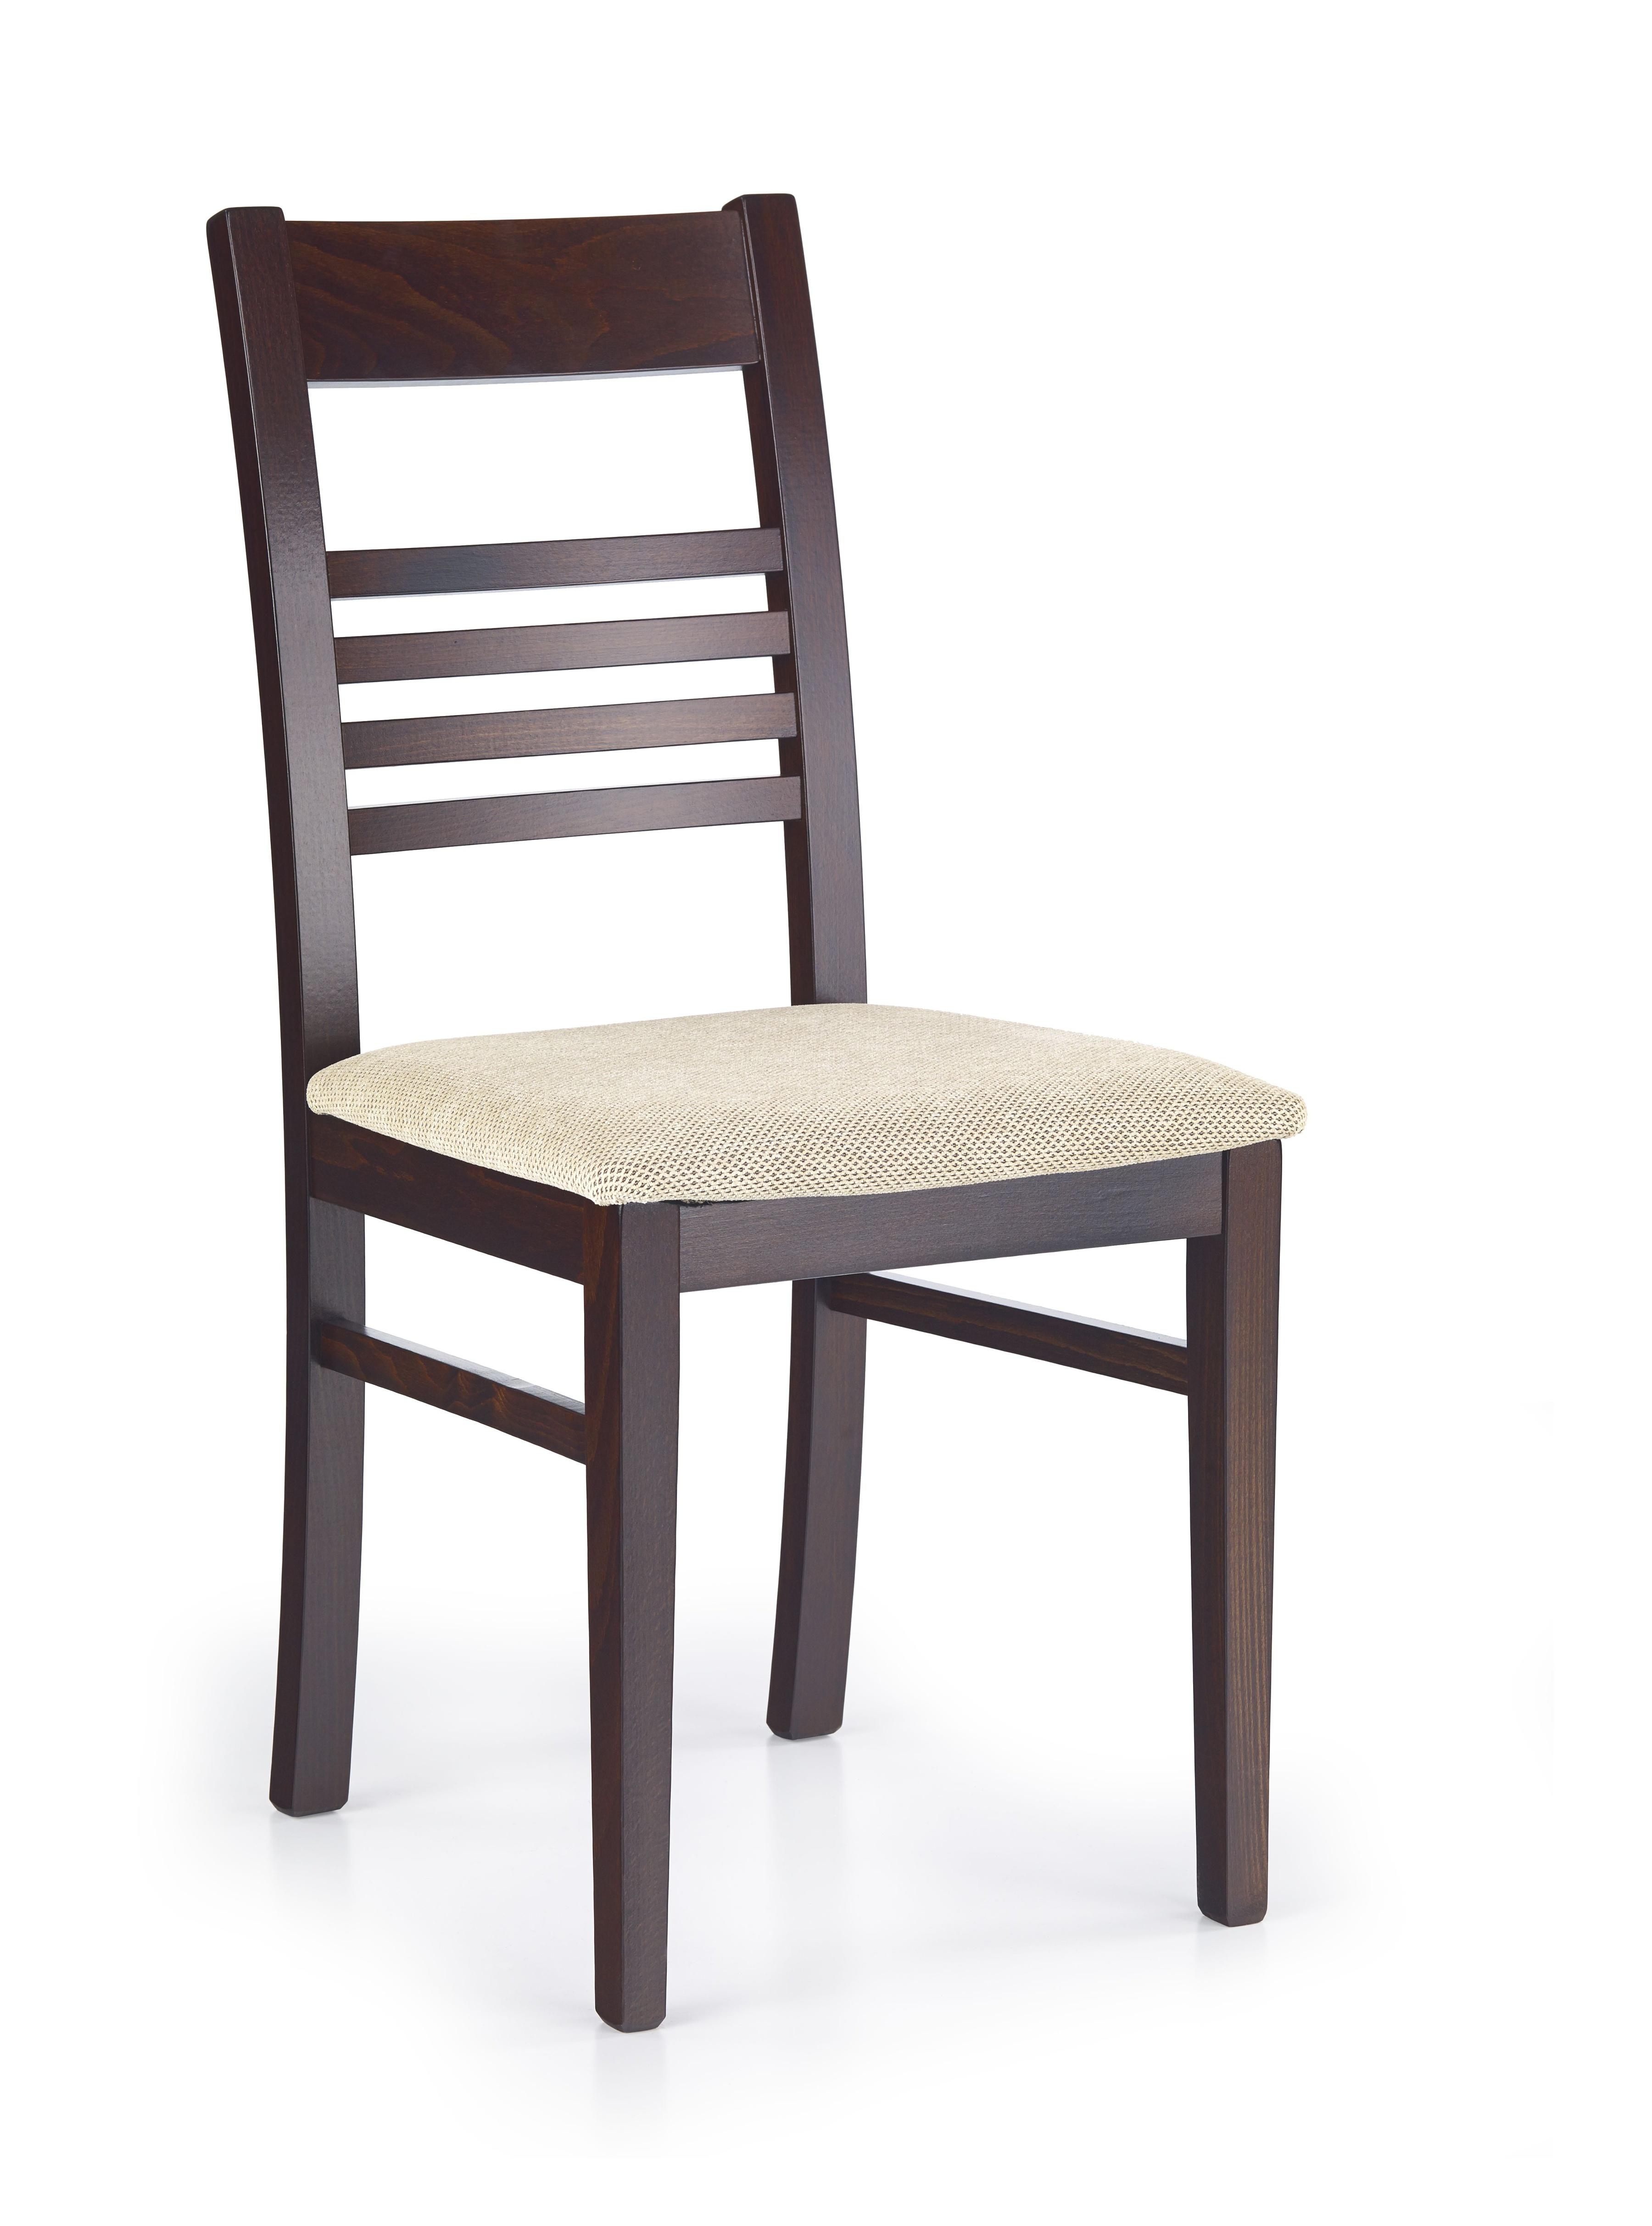 Jedálenská stolička - Halmar - JULIUSZ Orech tmavý + Torent beige